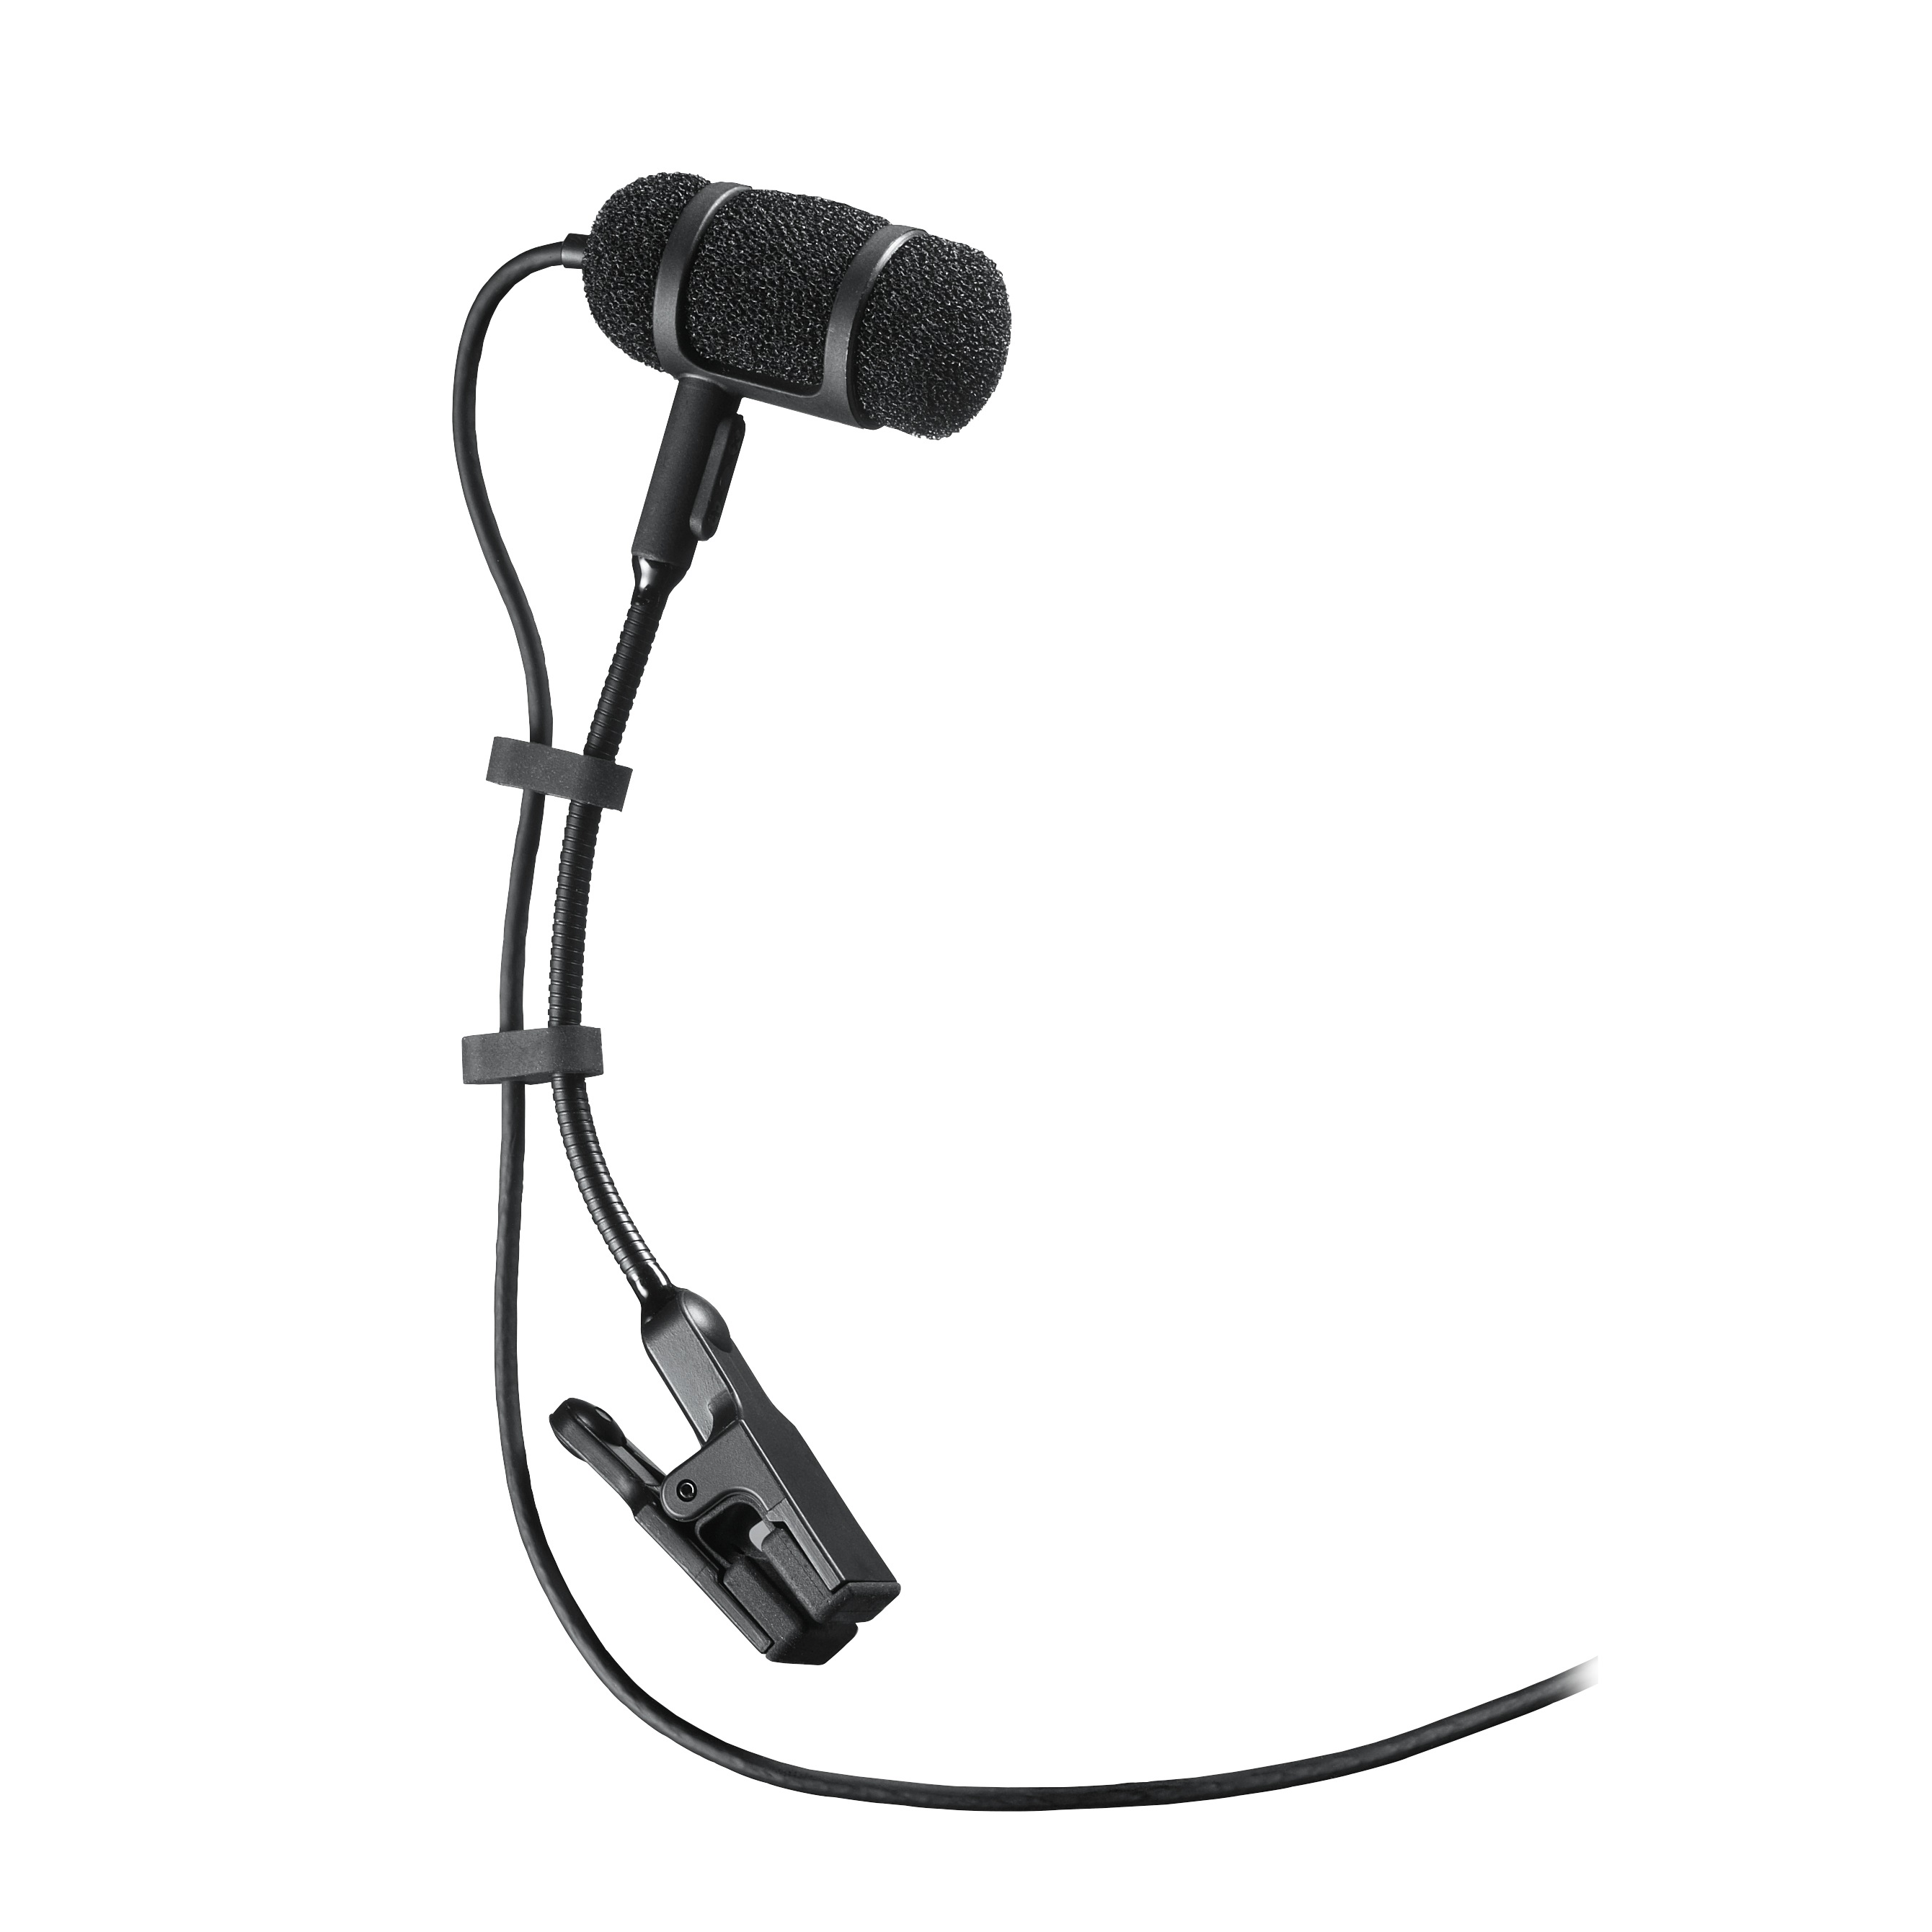 Audio-Technica AUDIO-TECHNICA PRO35